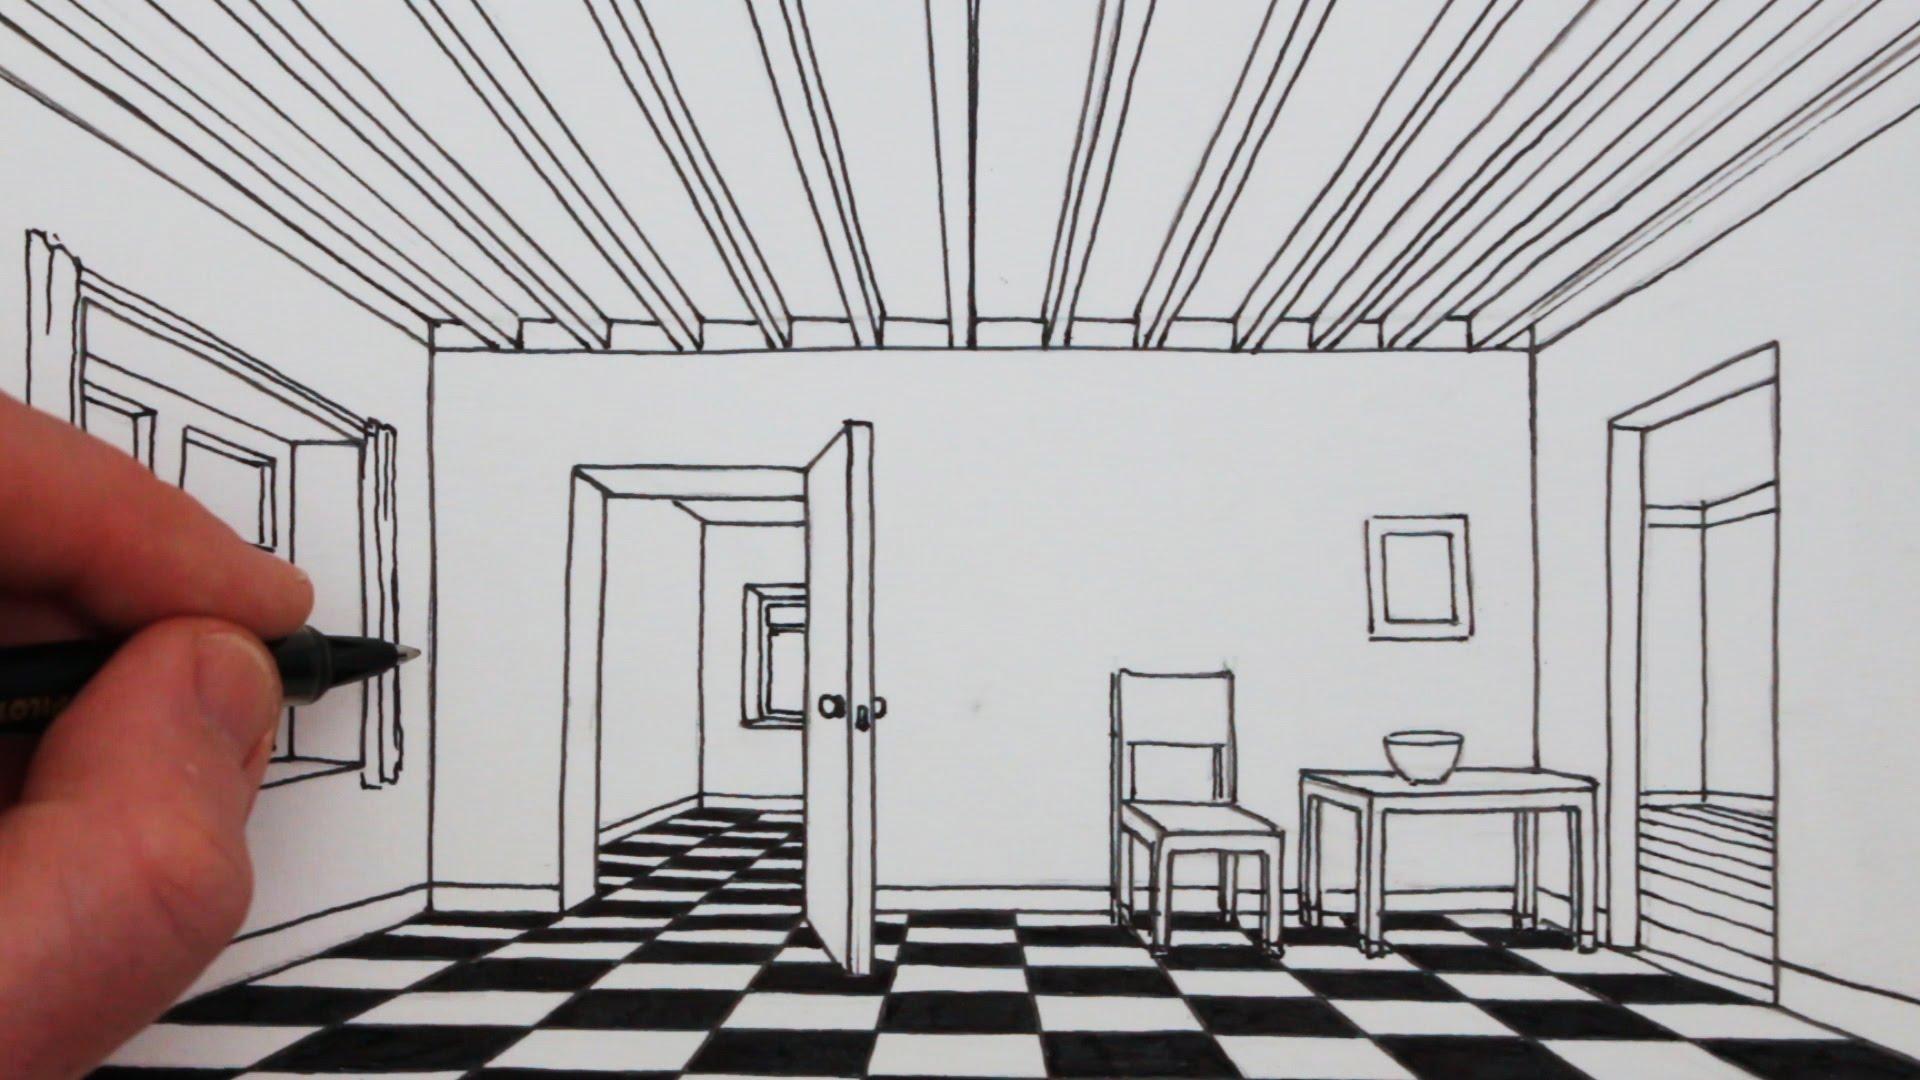 Bedroom Perspective Drawing At Getdrawings